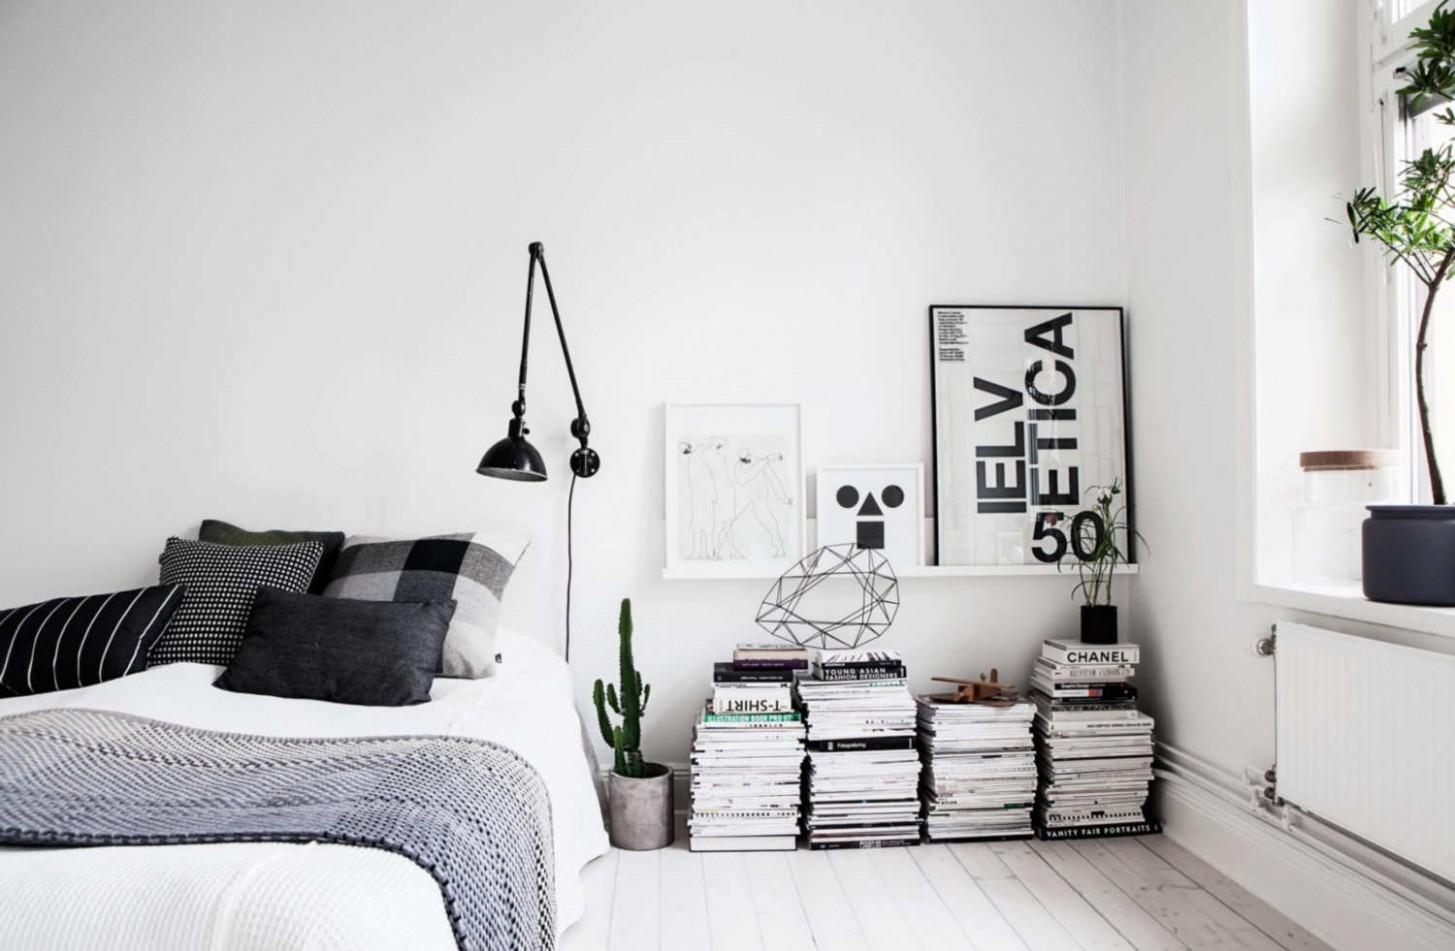 Minimalist Bedroom design ideas to decorate your home in style - Bedroom Ideas Minimalist